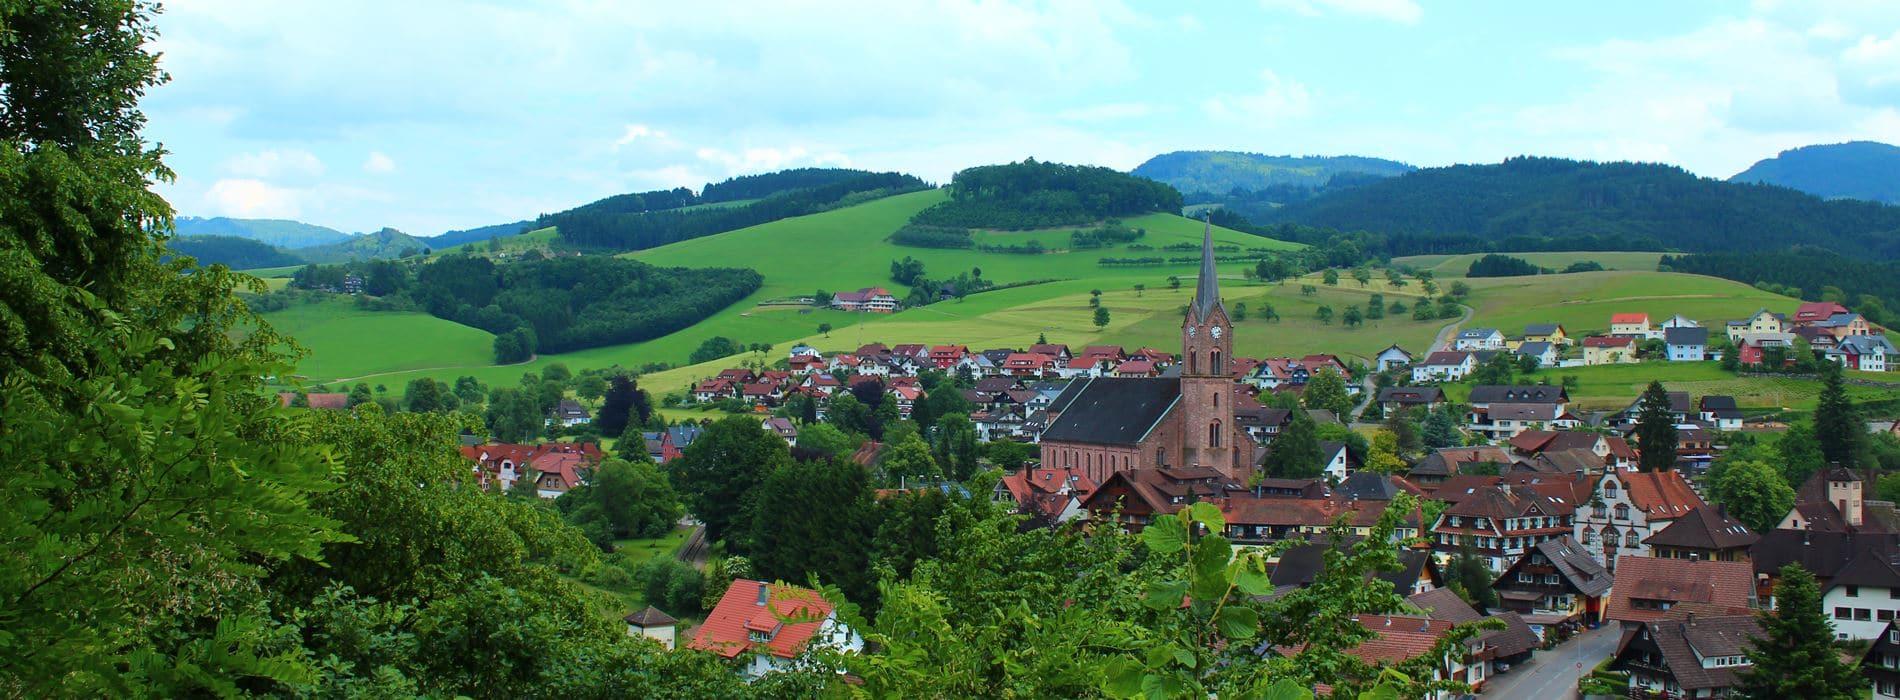 Oberharmersbach im Schwarzwald